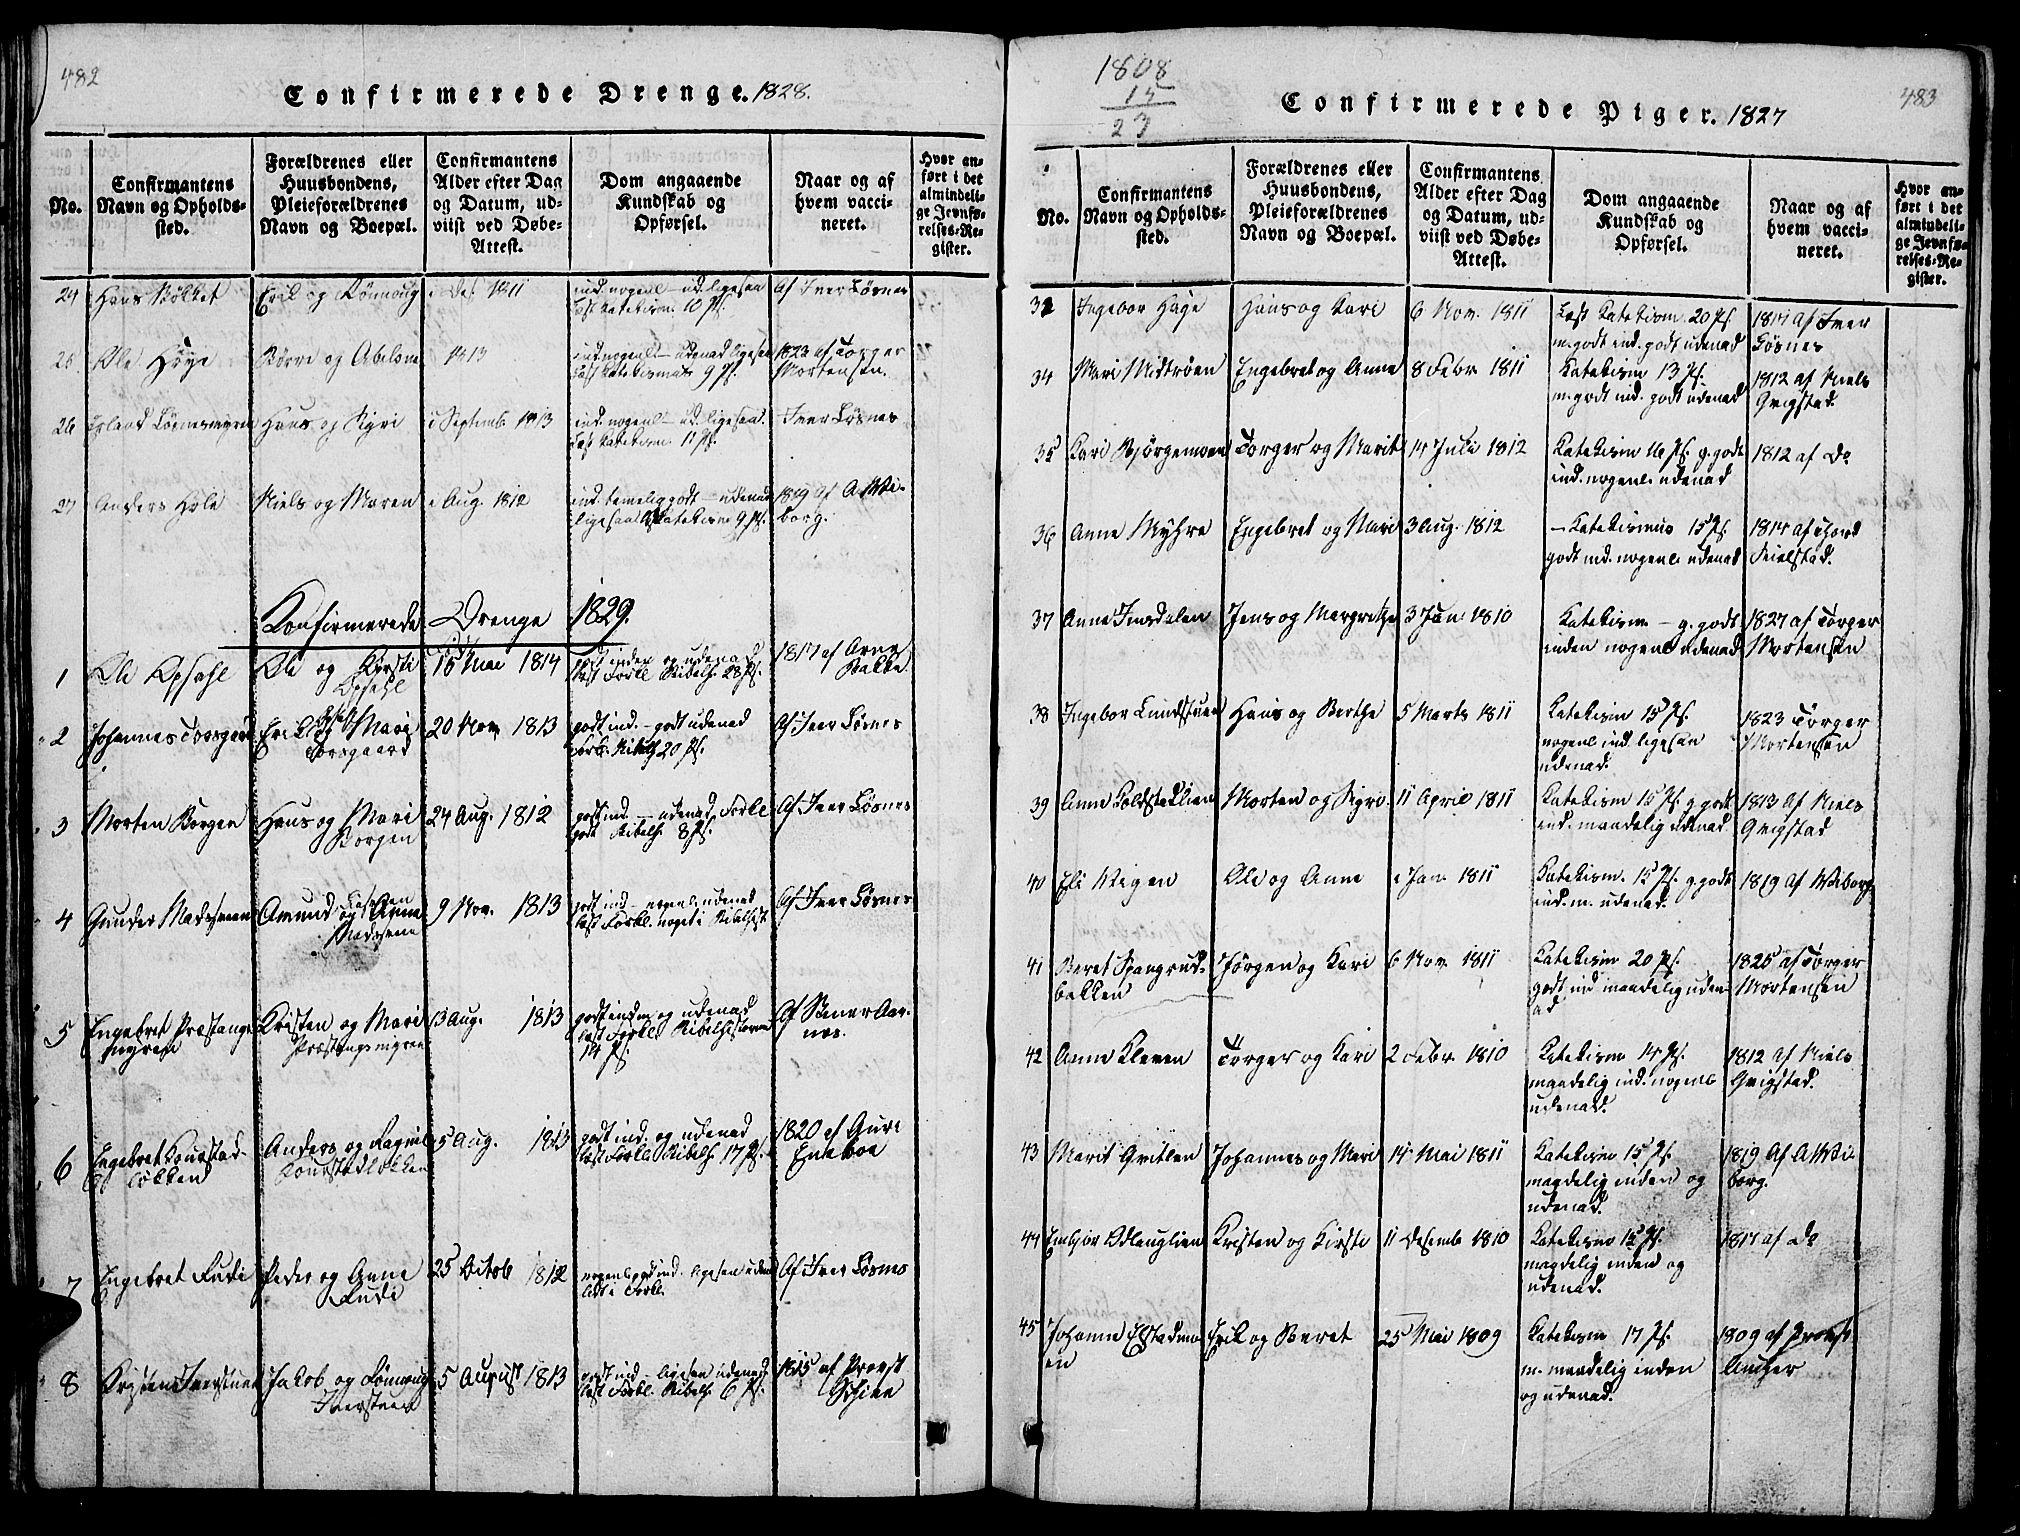 SAH, Ringebu prestekontor, Klokkerbok nr. 1, 1821-1839, s. 482-483